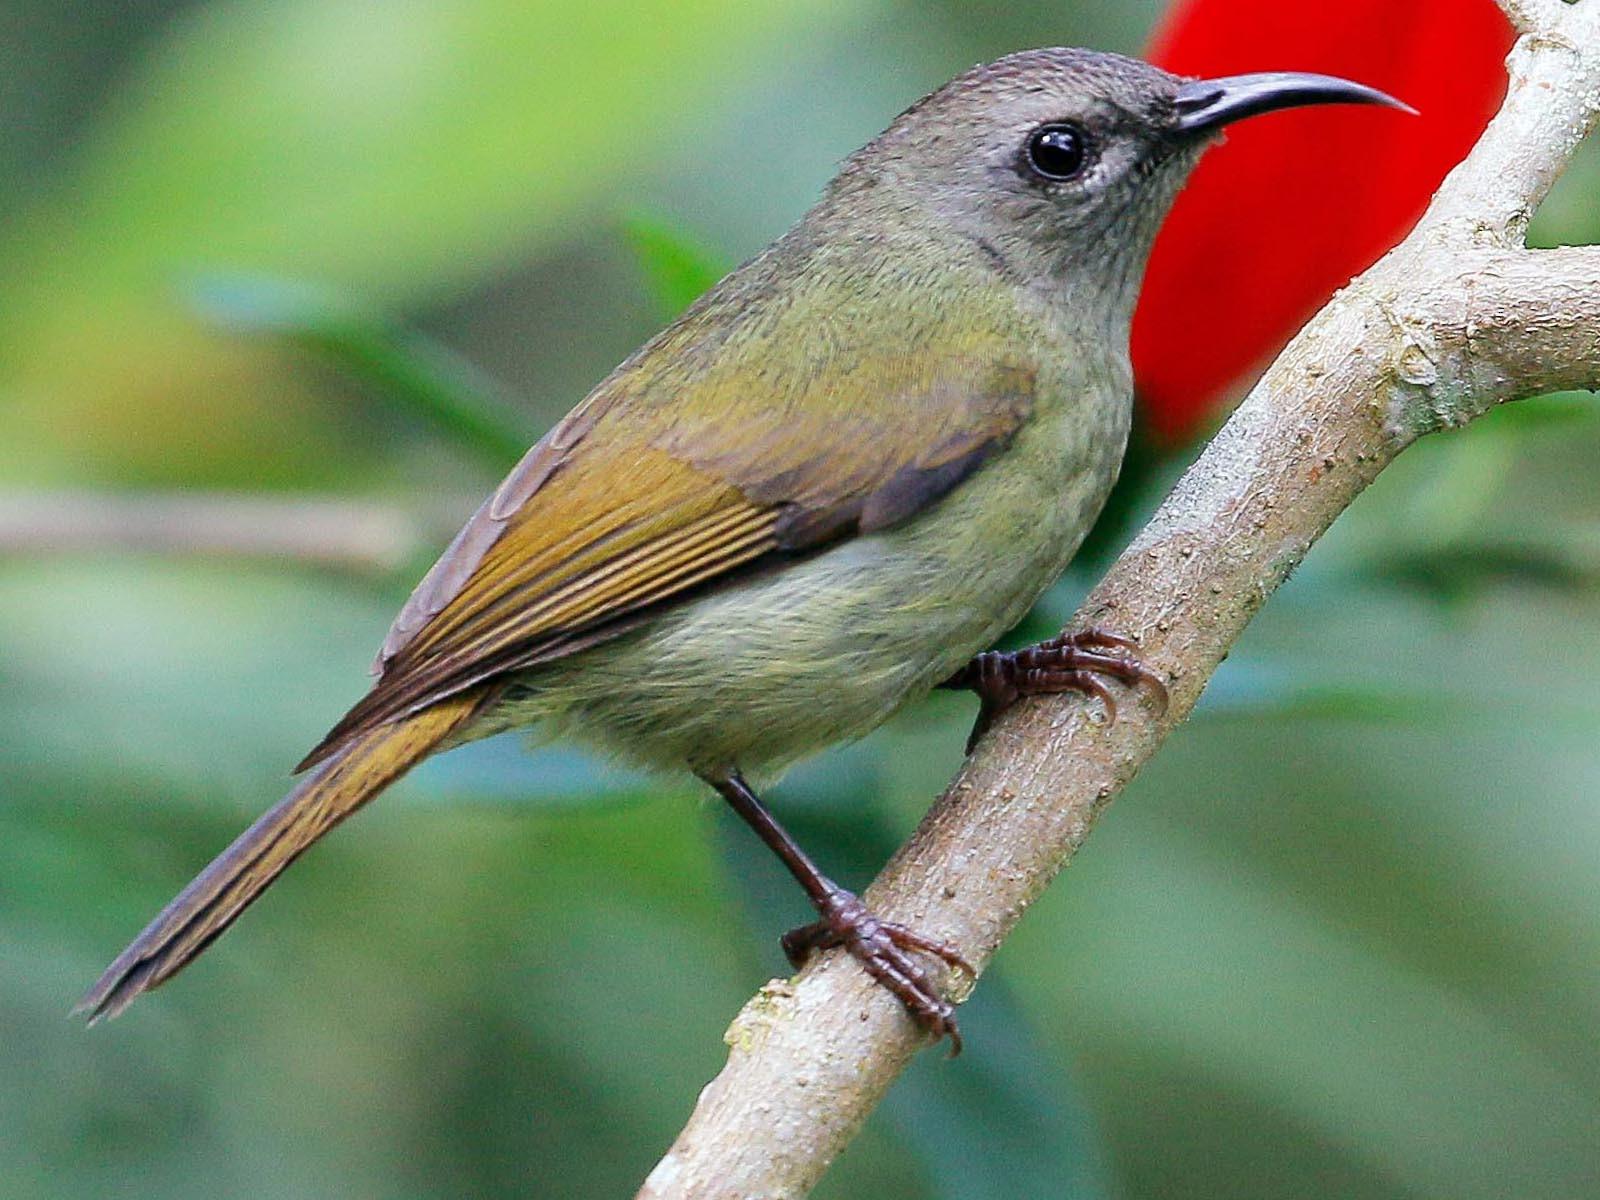 Black-throated Sunbird - Neoh Hor Kee